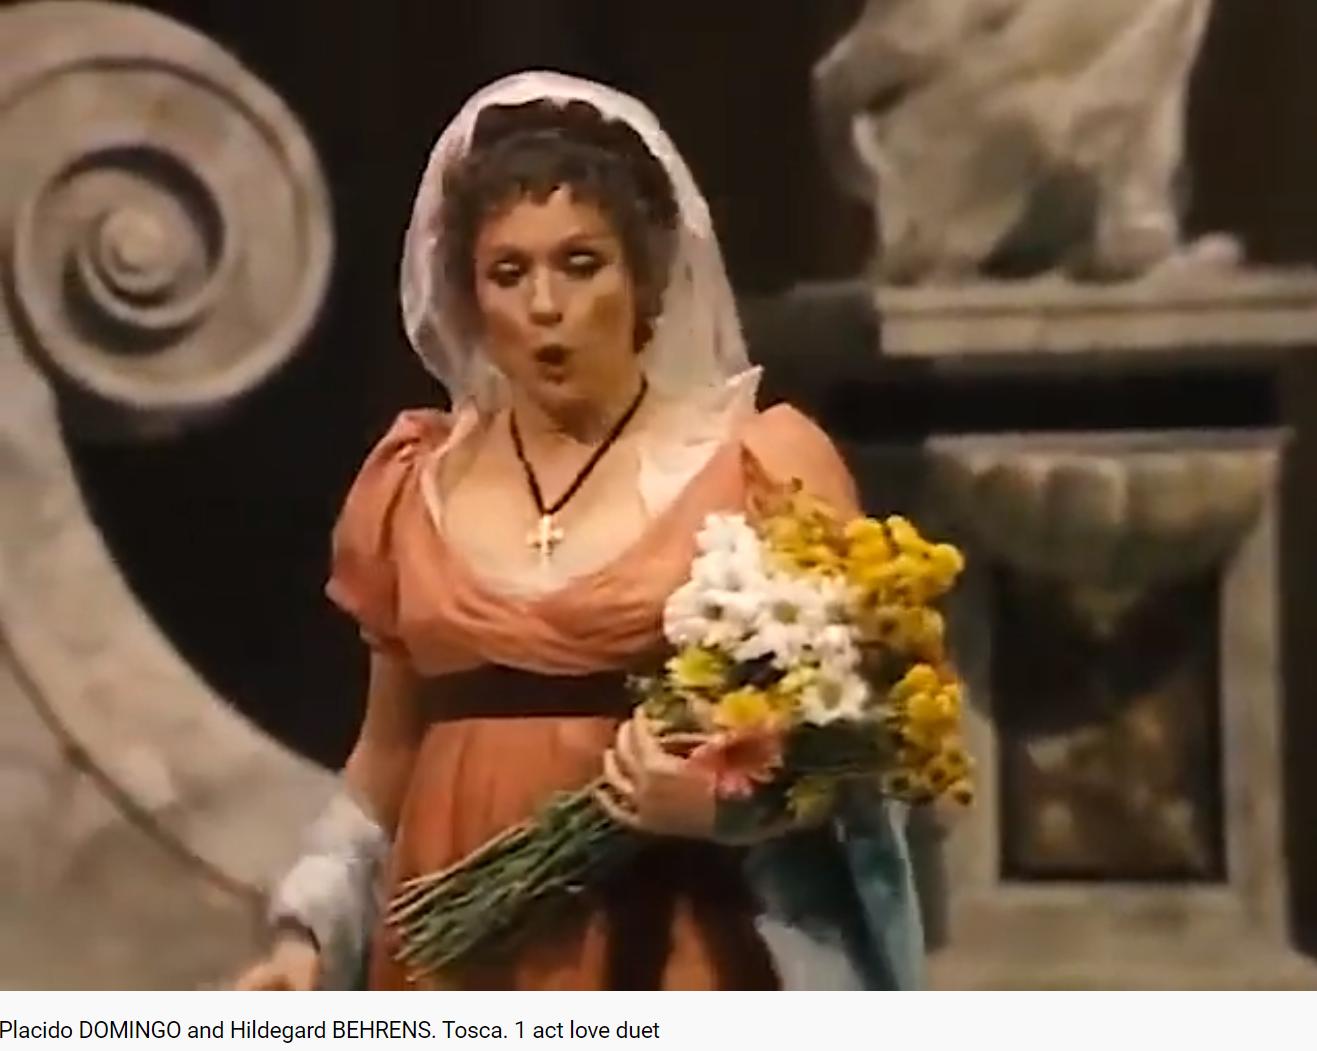 Puccini Tosca duo d'amour du 1er acte (MET 1985)